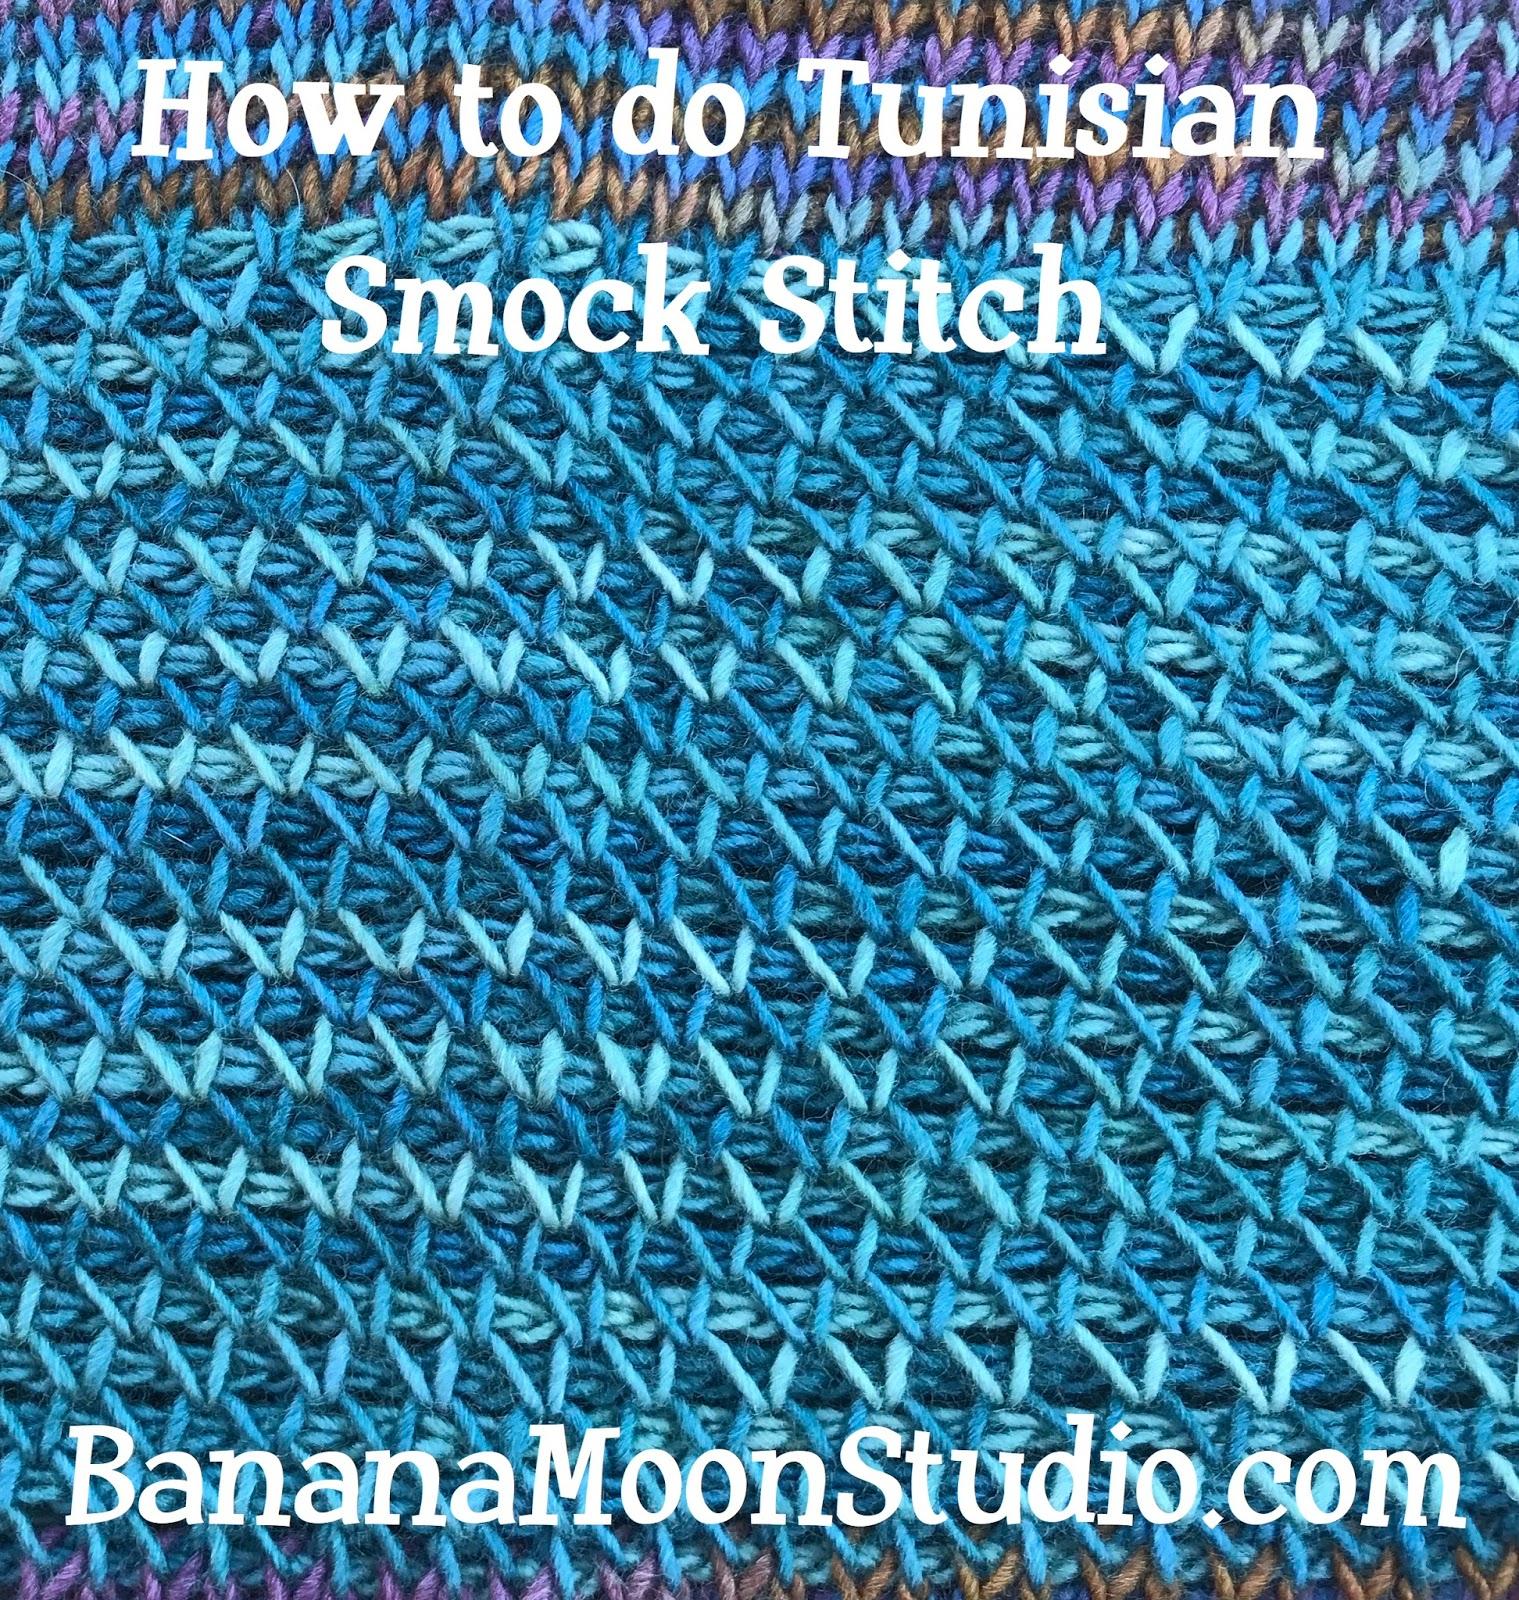 How to do Tunisian smock stitch, tutorial by April Garwood of Banana Moon Studio